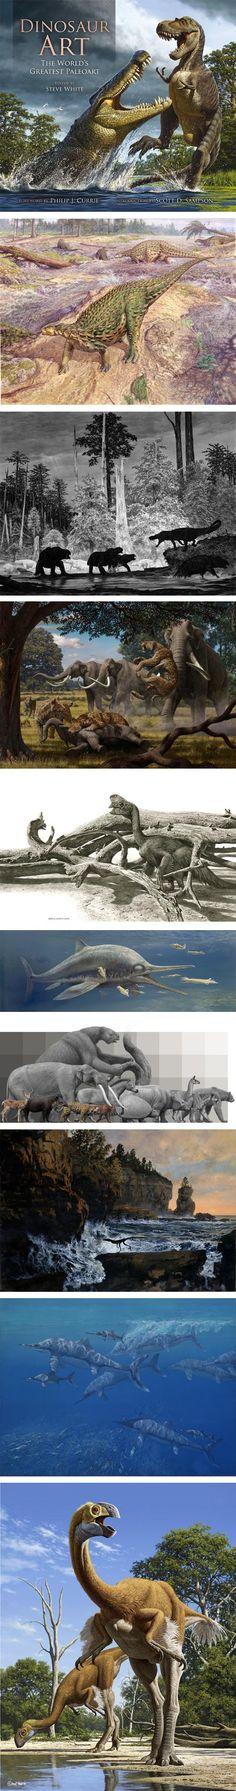 Dinosaur Art: The World's Greatest Paleoart: Raul Martin, John Sibbick, Douglas Henderson, Mauricio Antón.